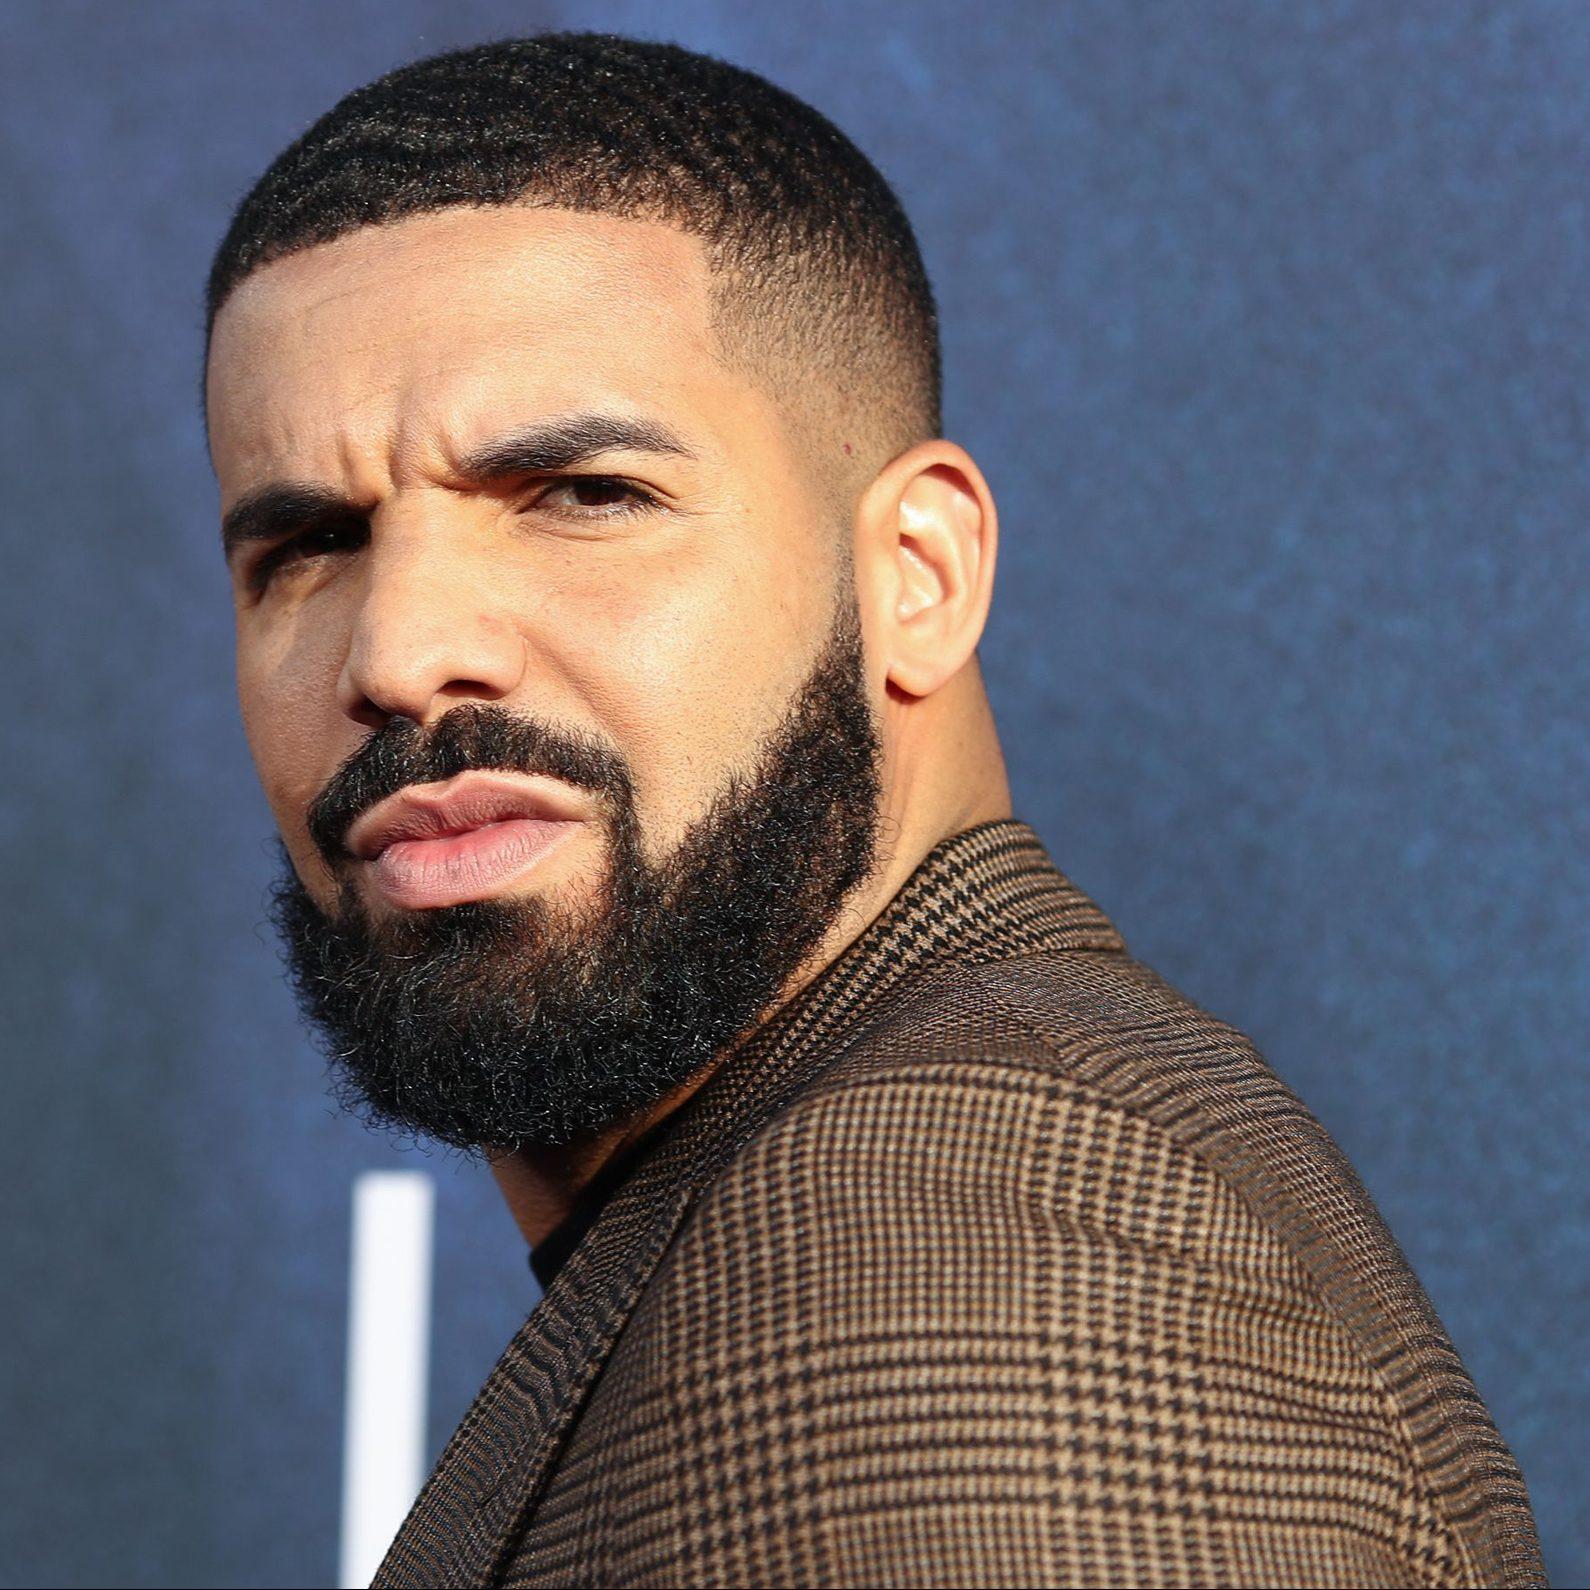 Drake wears a plaid blazer to the premiere of Euphoria